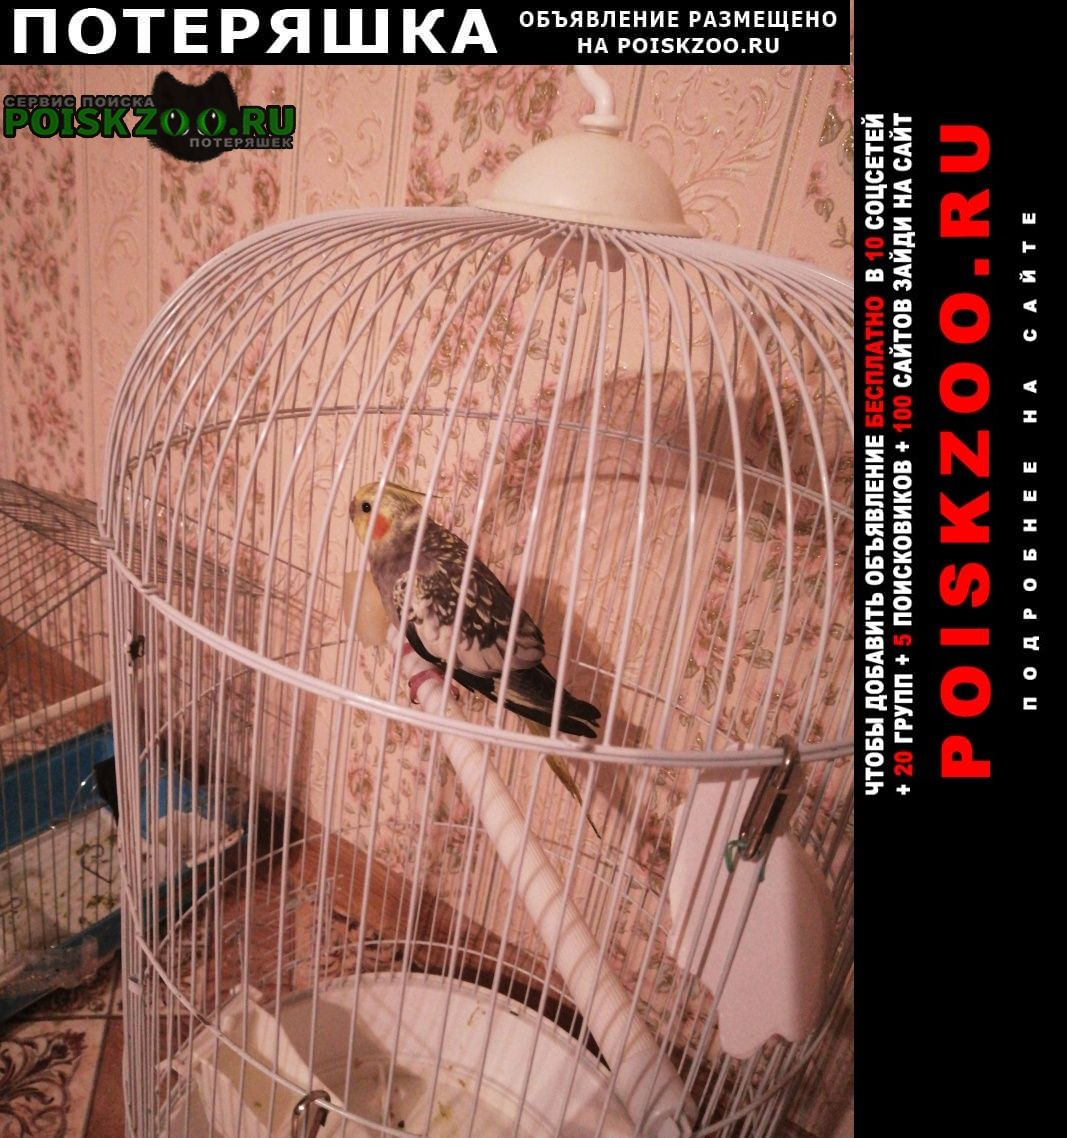 Пропал попугай улетел корелла в щербинках Нижний Новгород